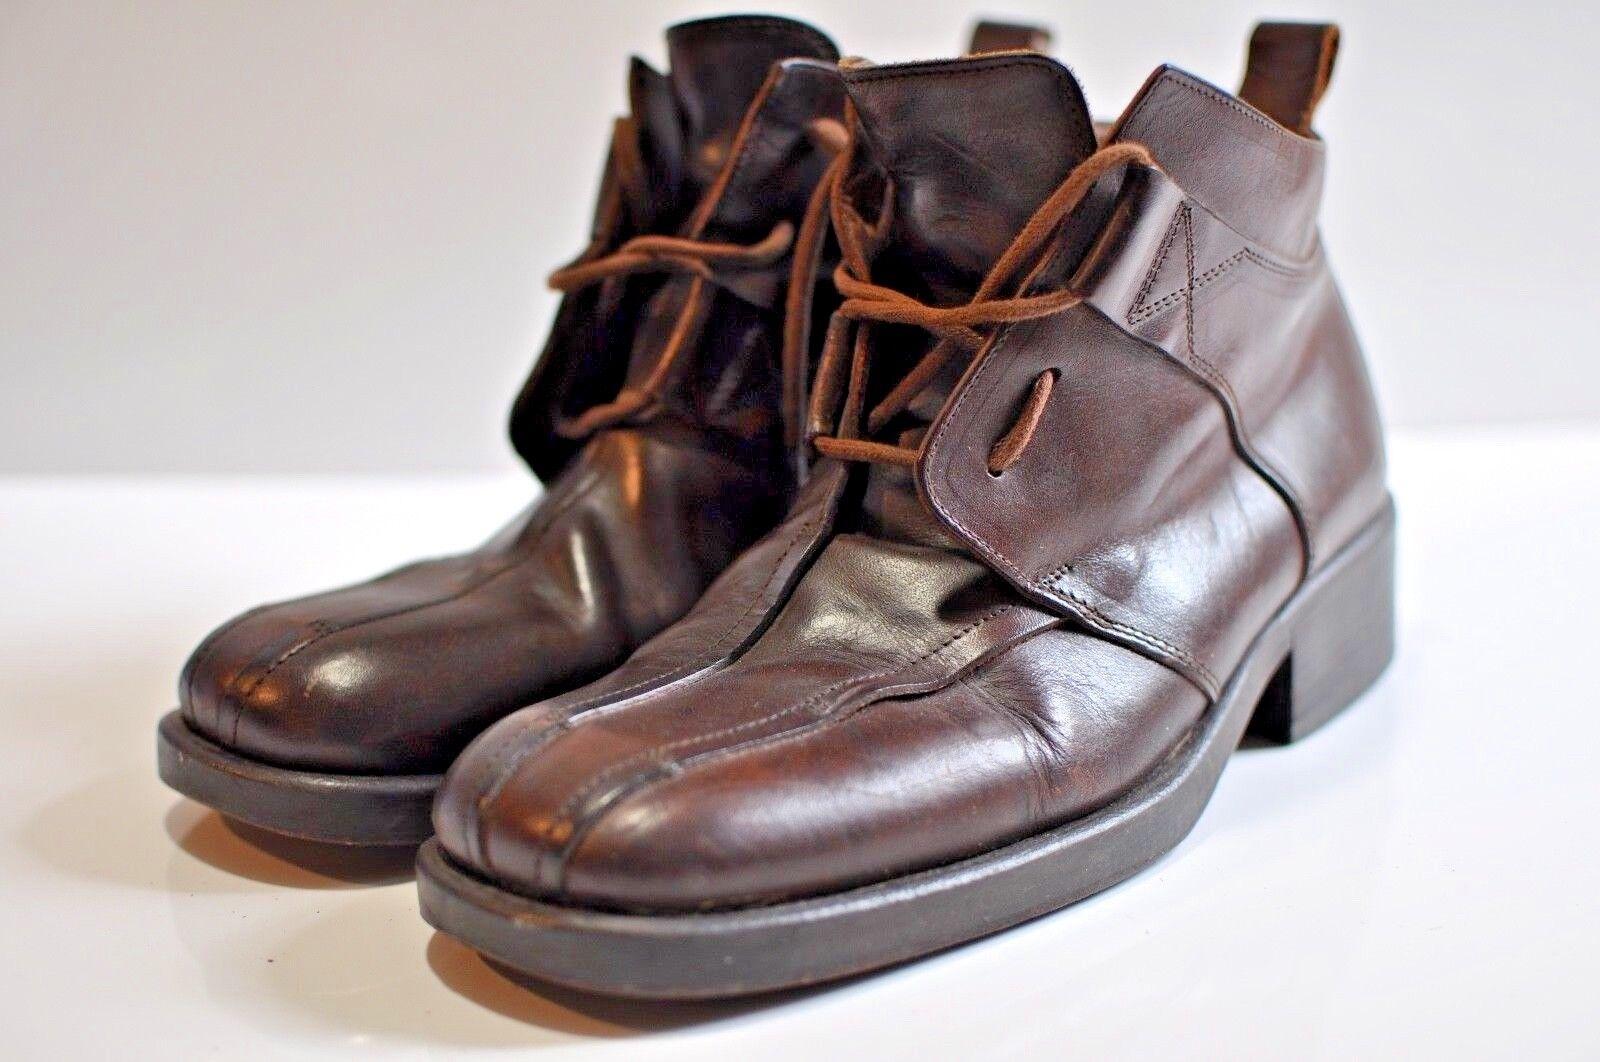 Da Vinci Mens leather stivali Dimensione 43 made in